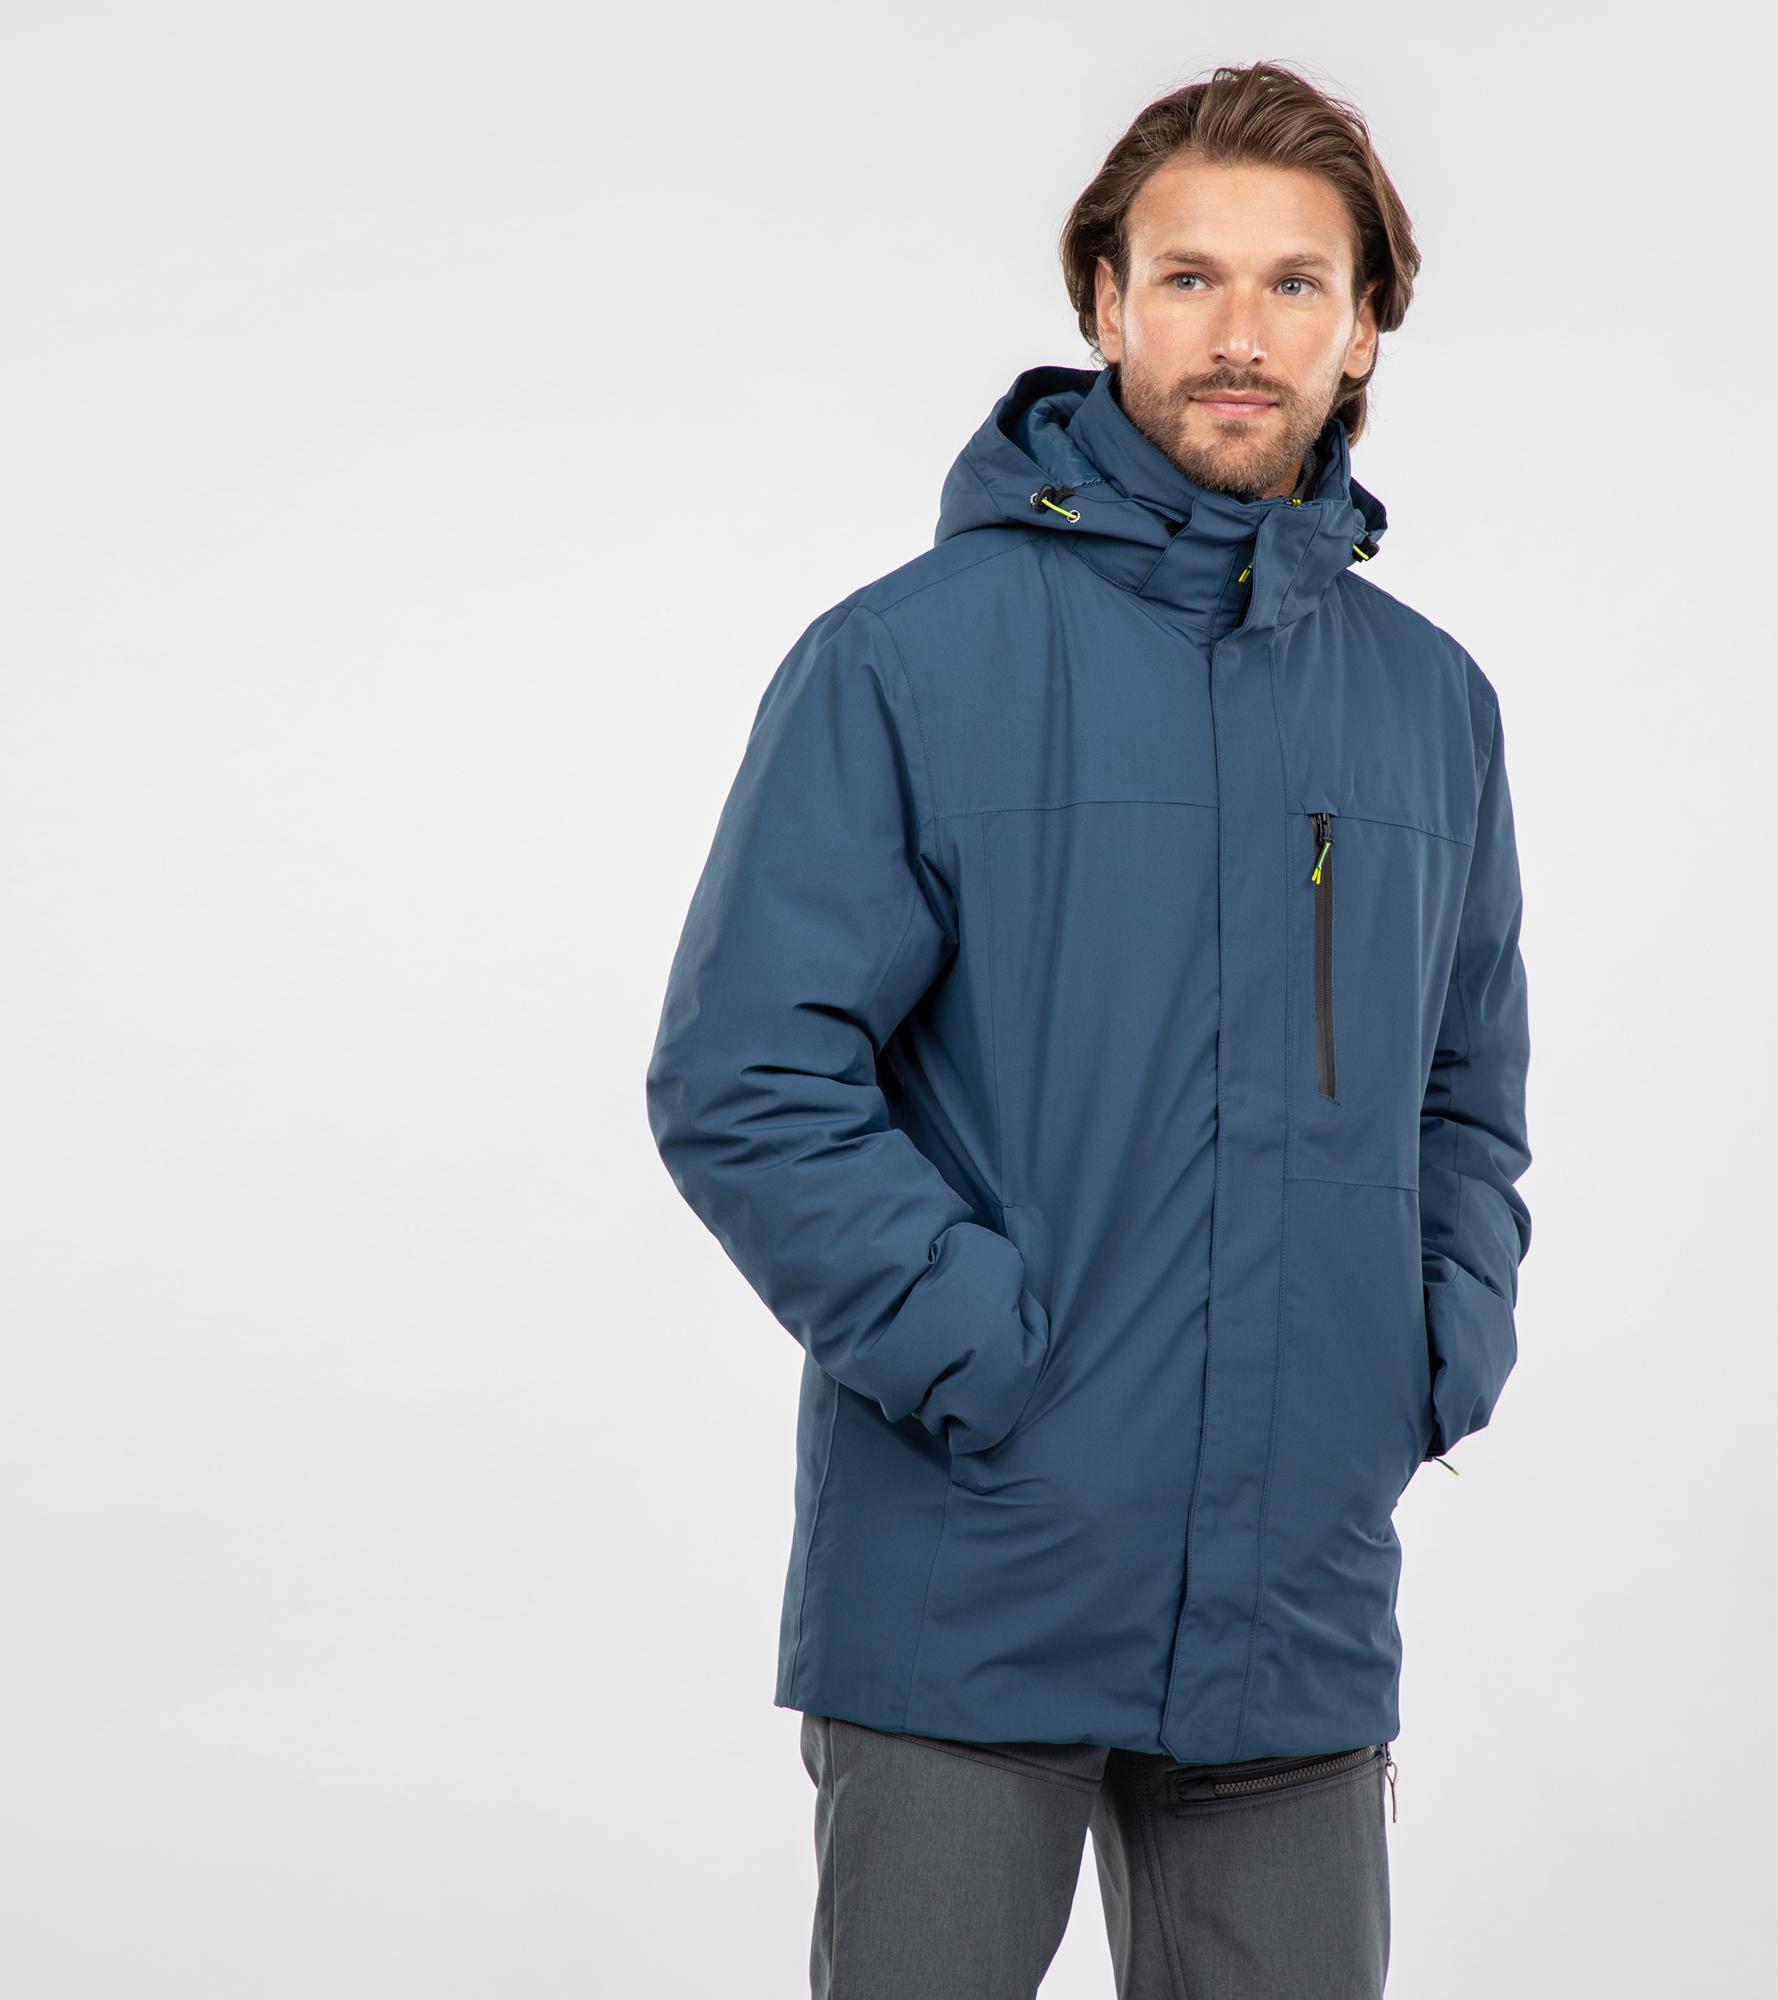 IcePeak Куртка утепленная мужская IcePeak Piedmont, размер 46 цена 2017